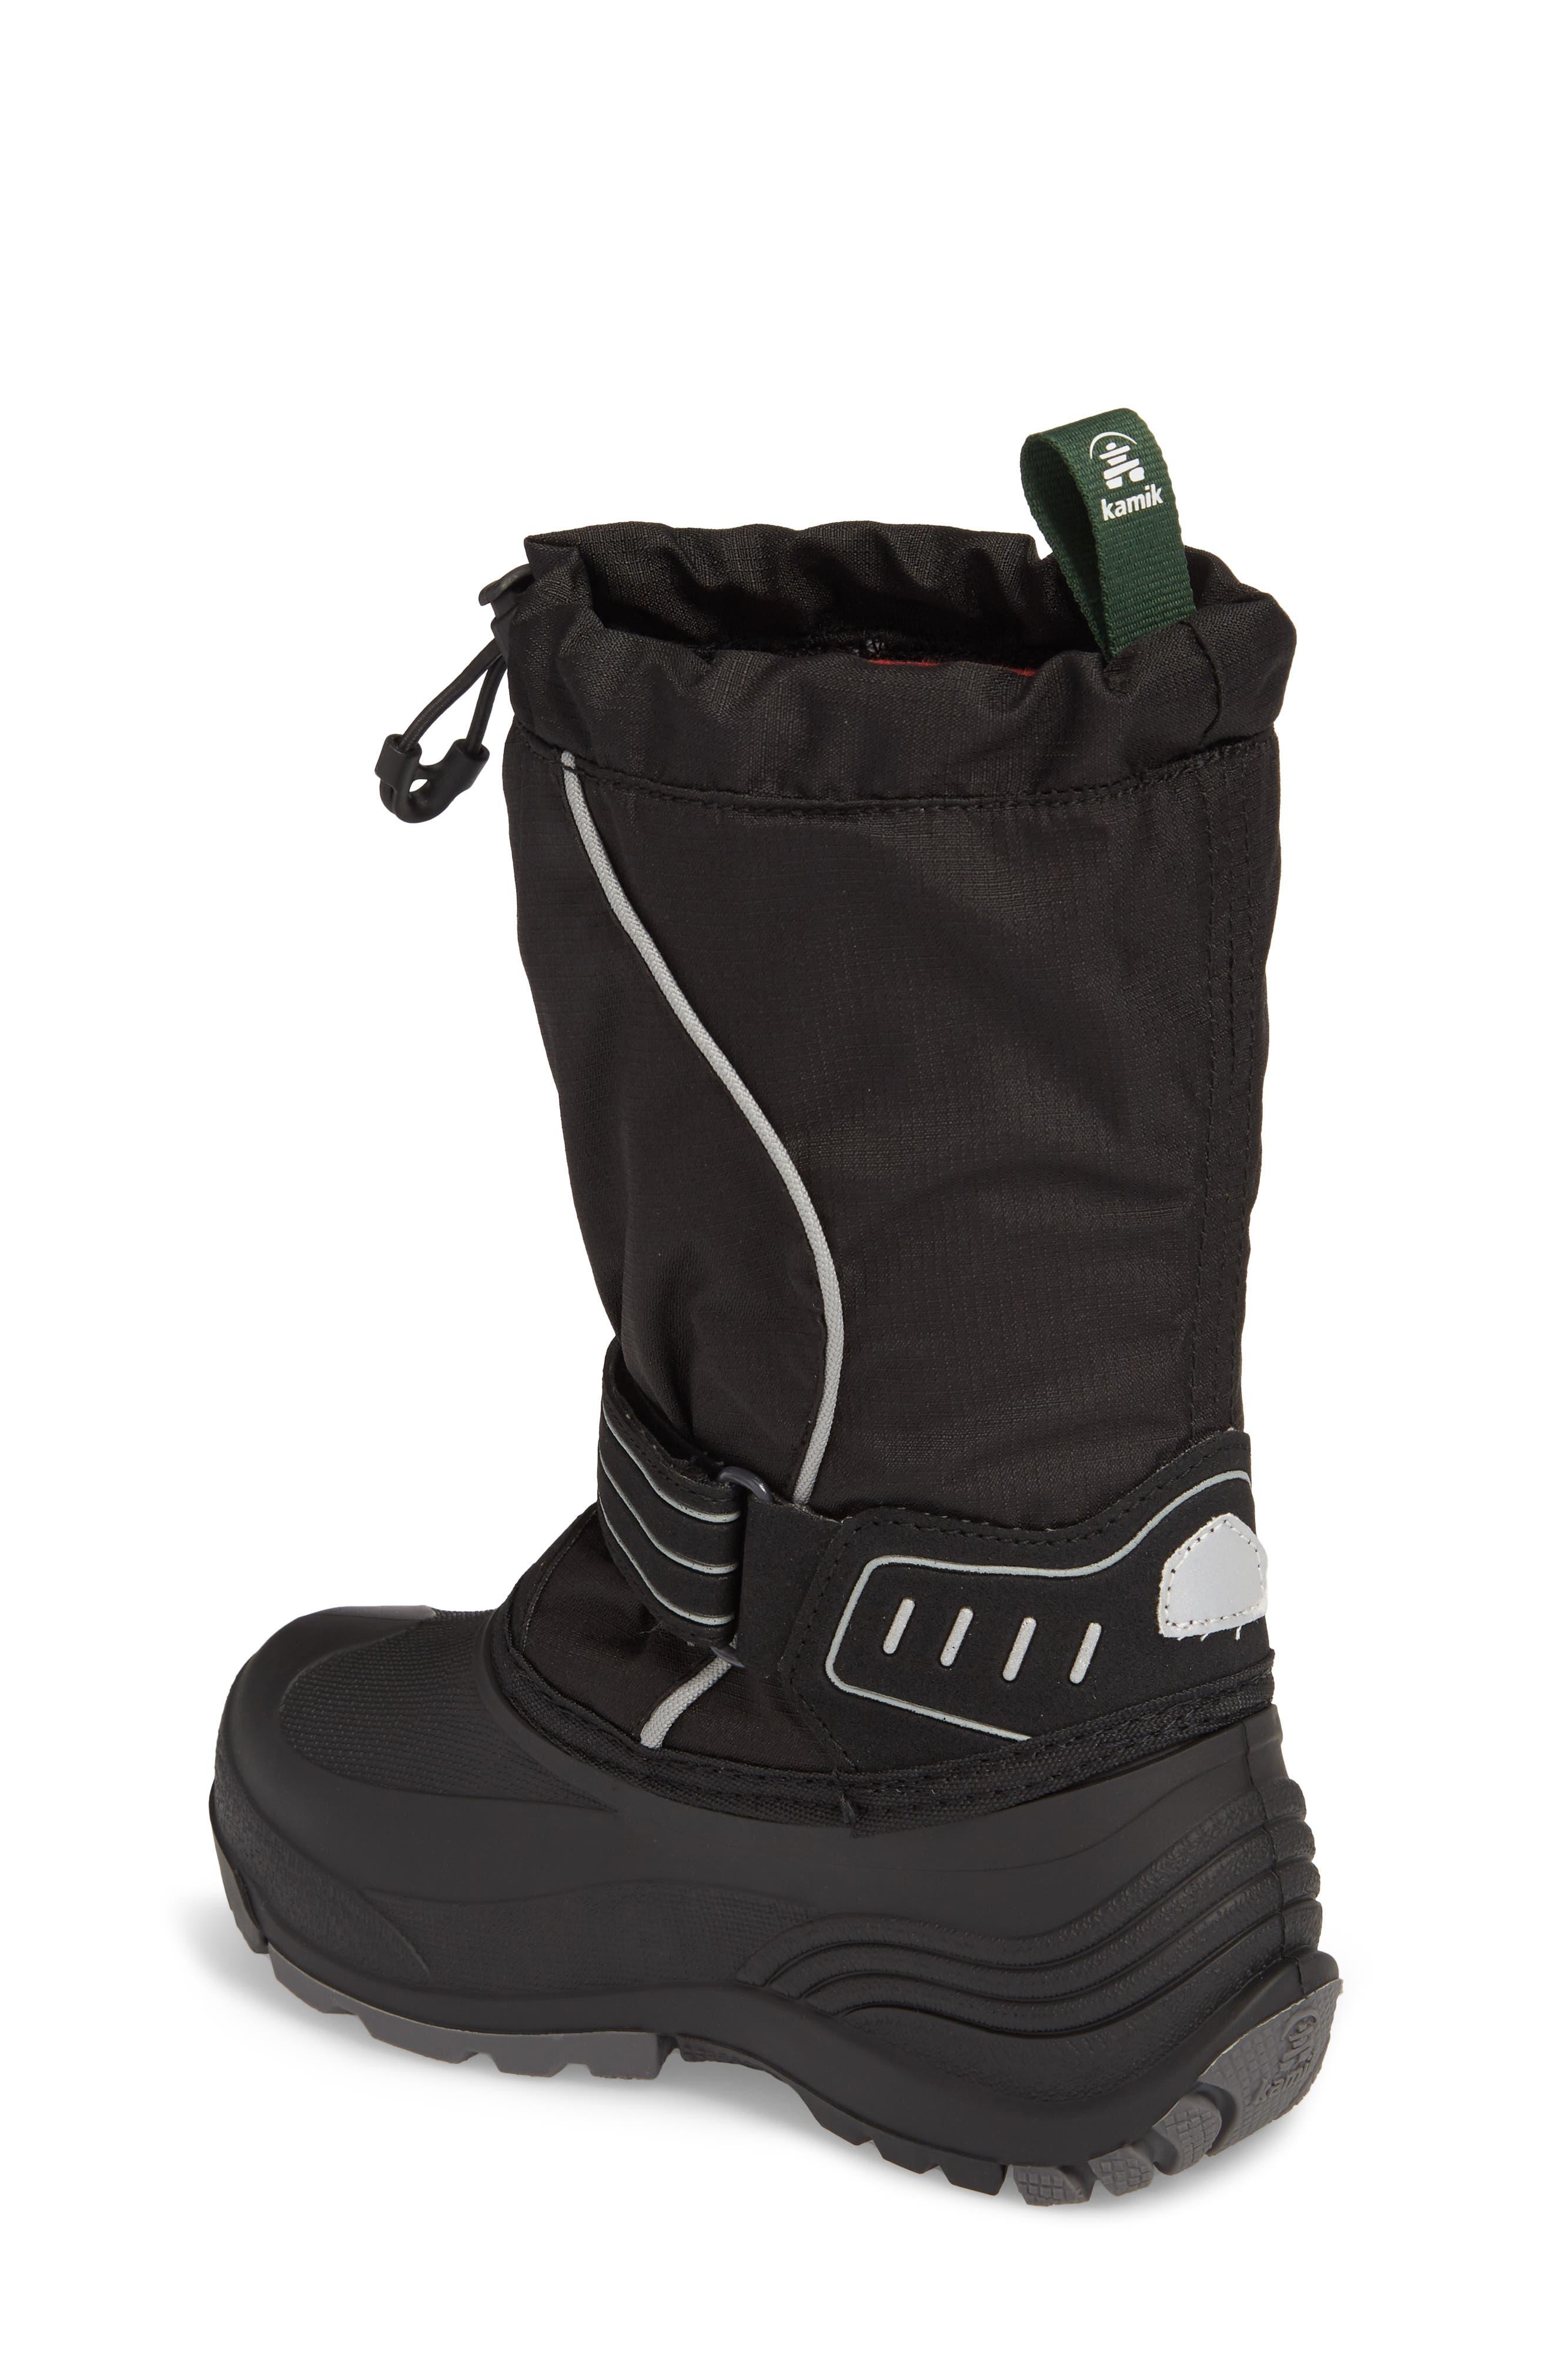 Alternate Image 2  - Kamik Snowcoast3 Waterproof Snow Boot (Toddler, Little Kid & Big Kid)